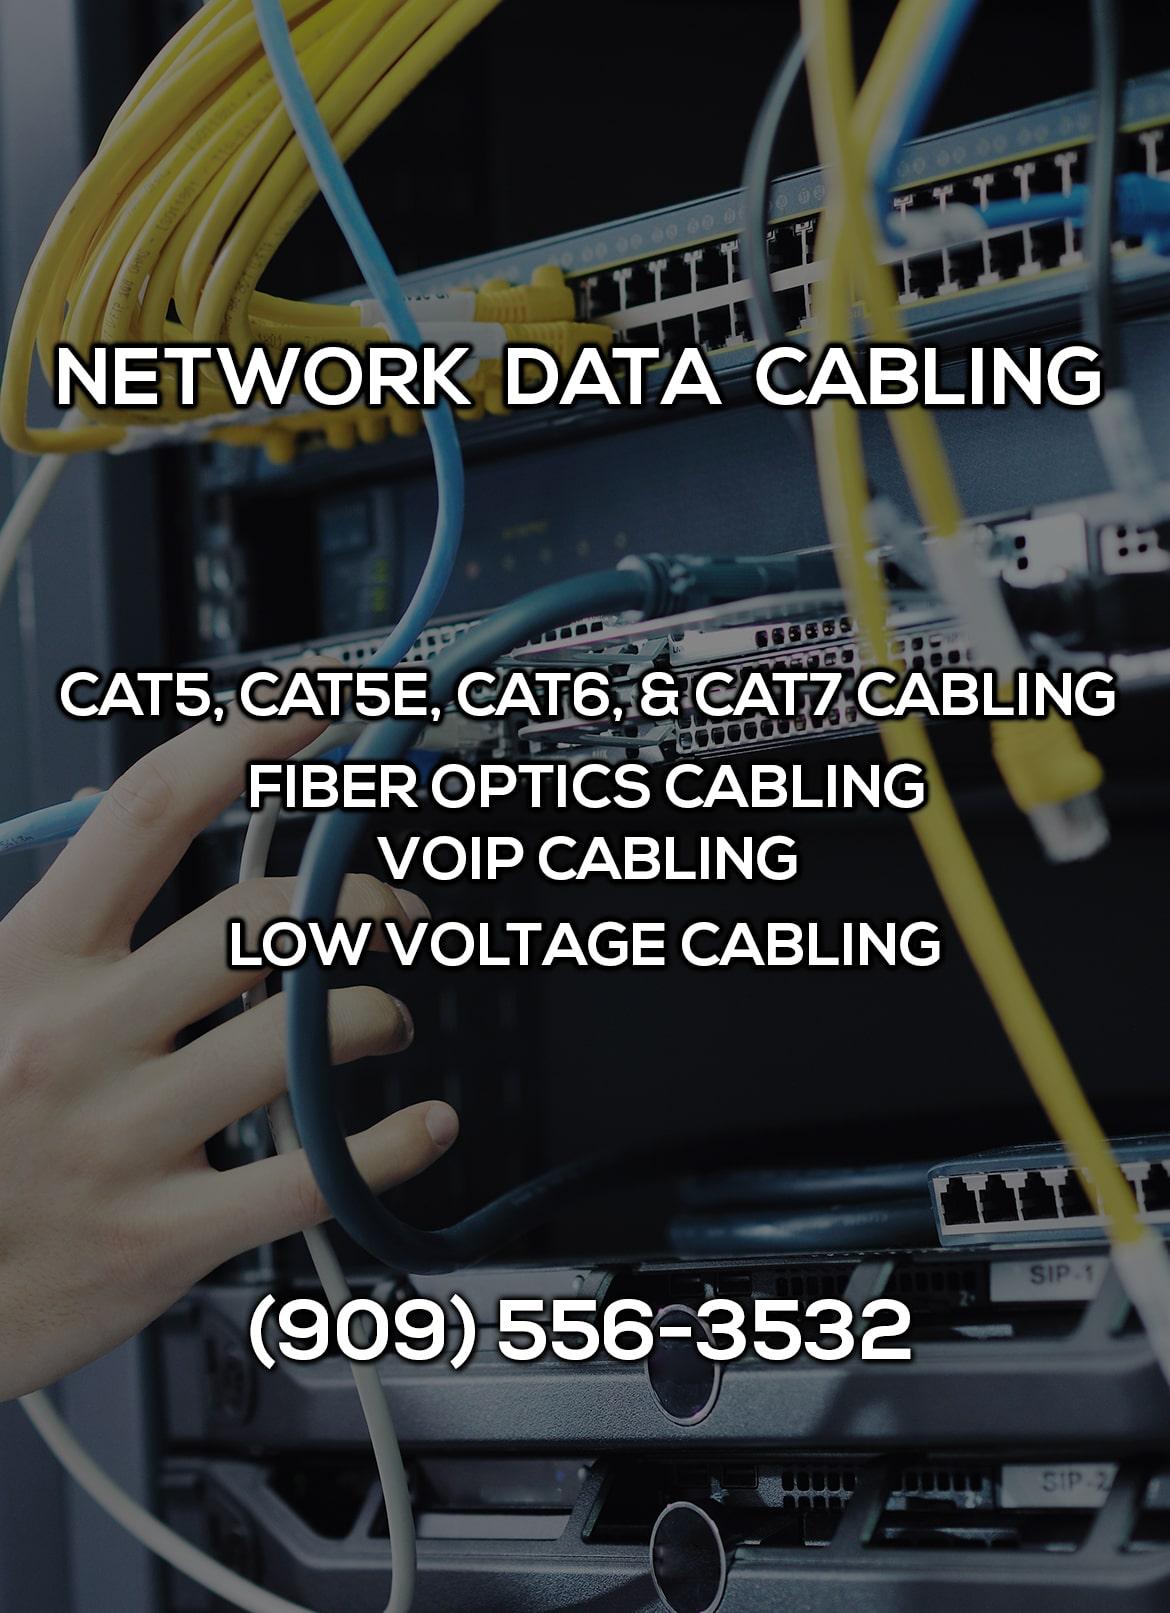 Network Data Cabling in Desert Hot Springs CA